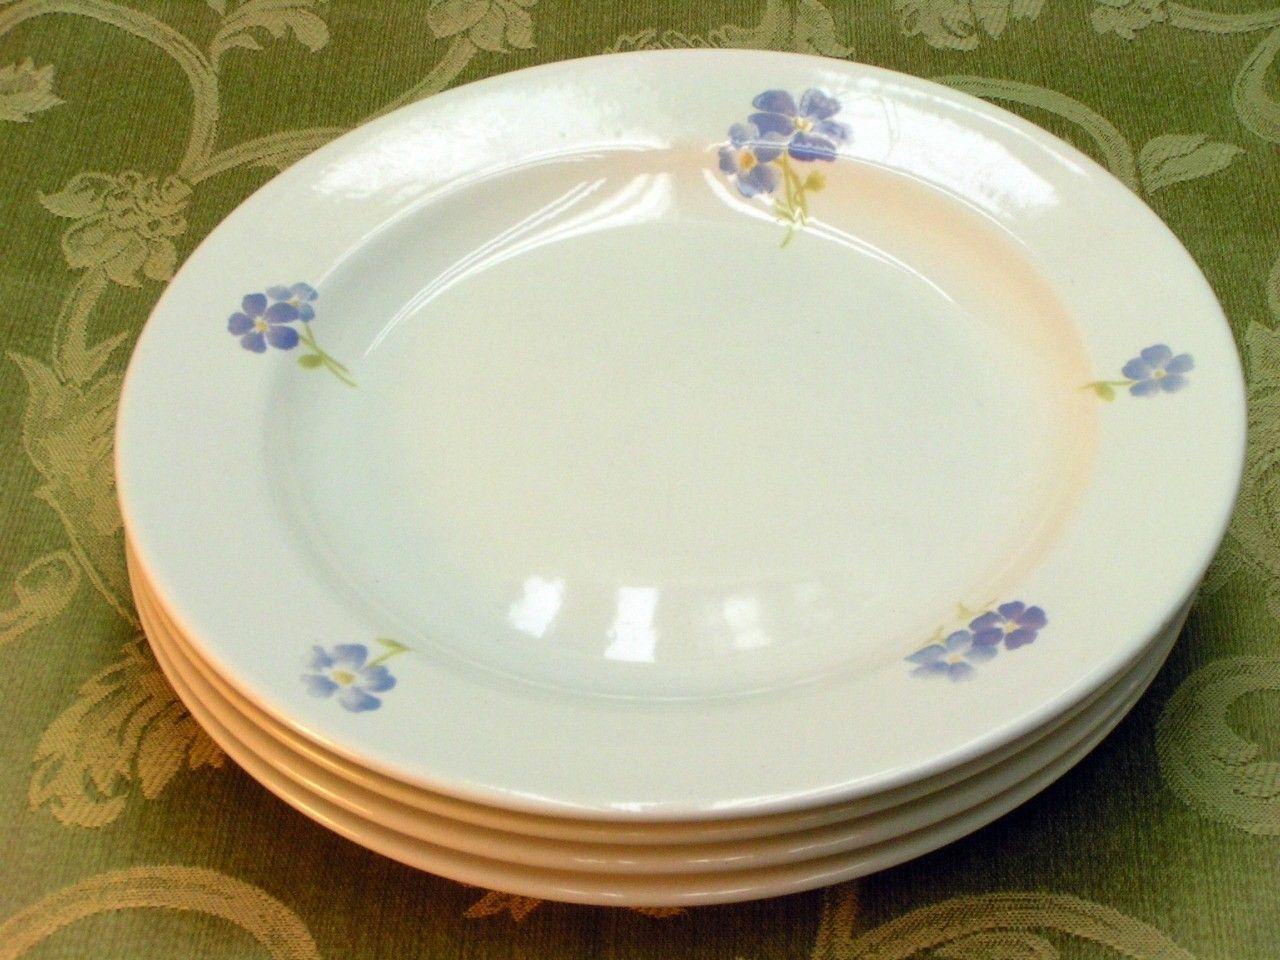 Forget Me Not Martha Stewart LOT 4 SALAD DESSERT PLATES - $43.00 & Martha Stewart Plates: 2 listings